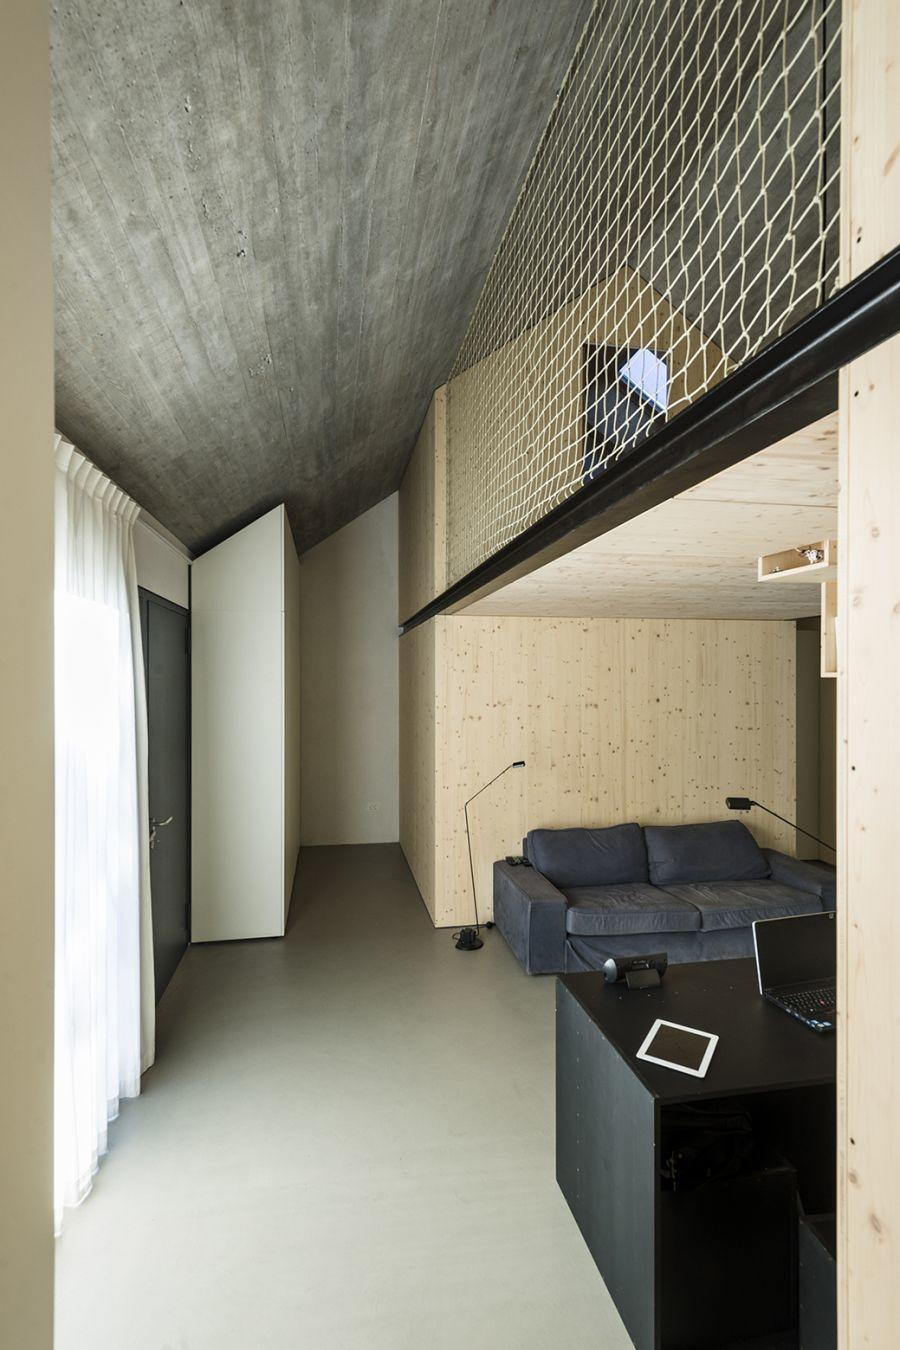 diaforetiko.gr : compact karst house dekleva gregori arhitekti interior design1 Εκπληκτικό! Εξοχικό σπίτι συνδυάζει άψογα την παραδοσιακή με τη μοντέρνα αρχιτεκτονική!!